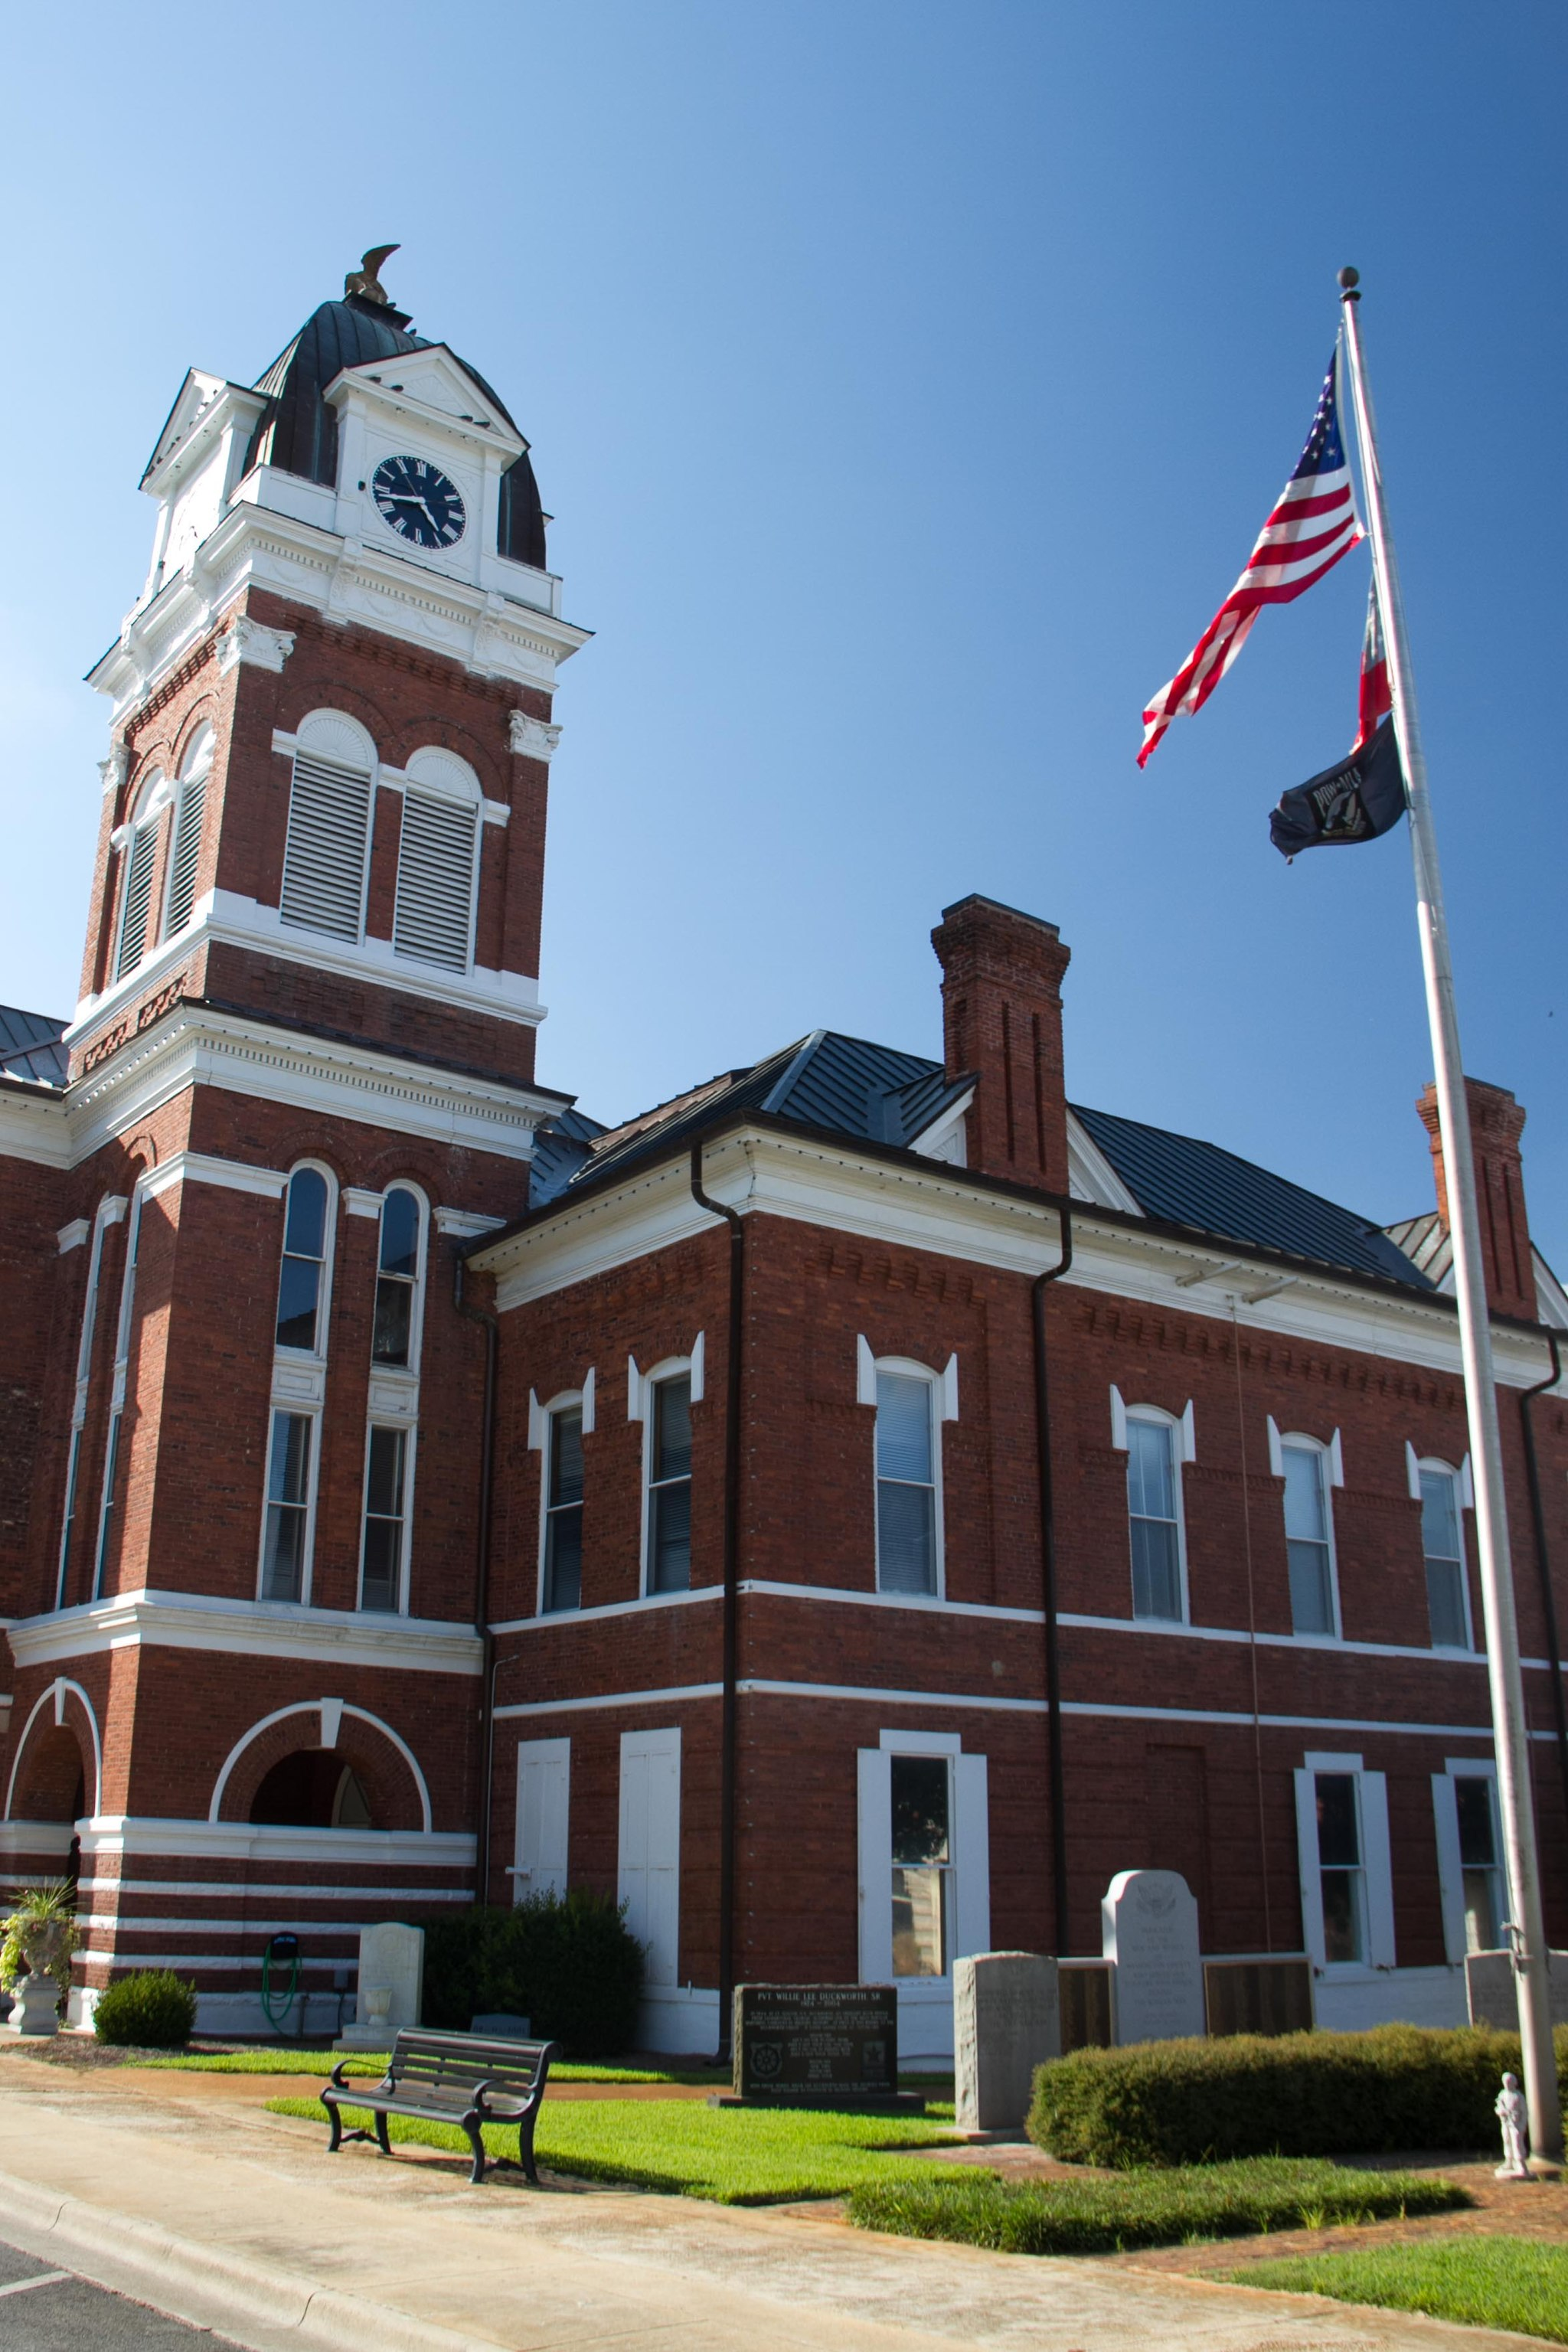 Courthouse in Sandersville